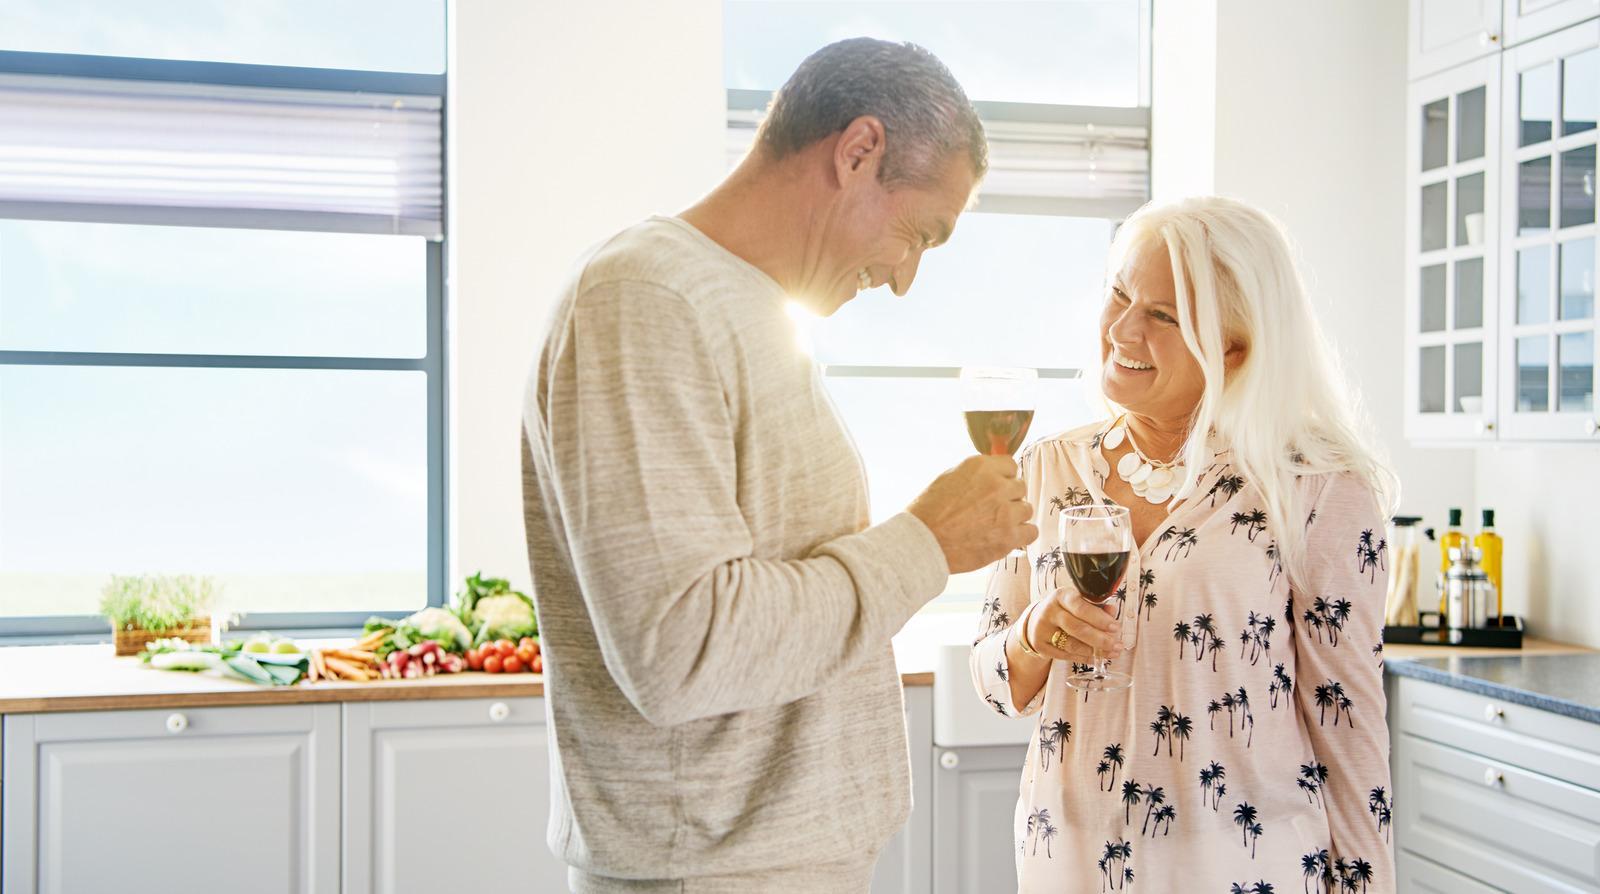 6 Steps to an Enjoyable, Fulfilling Retirement Thumbnail